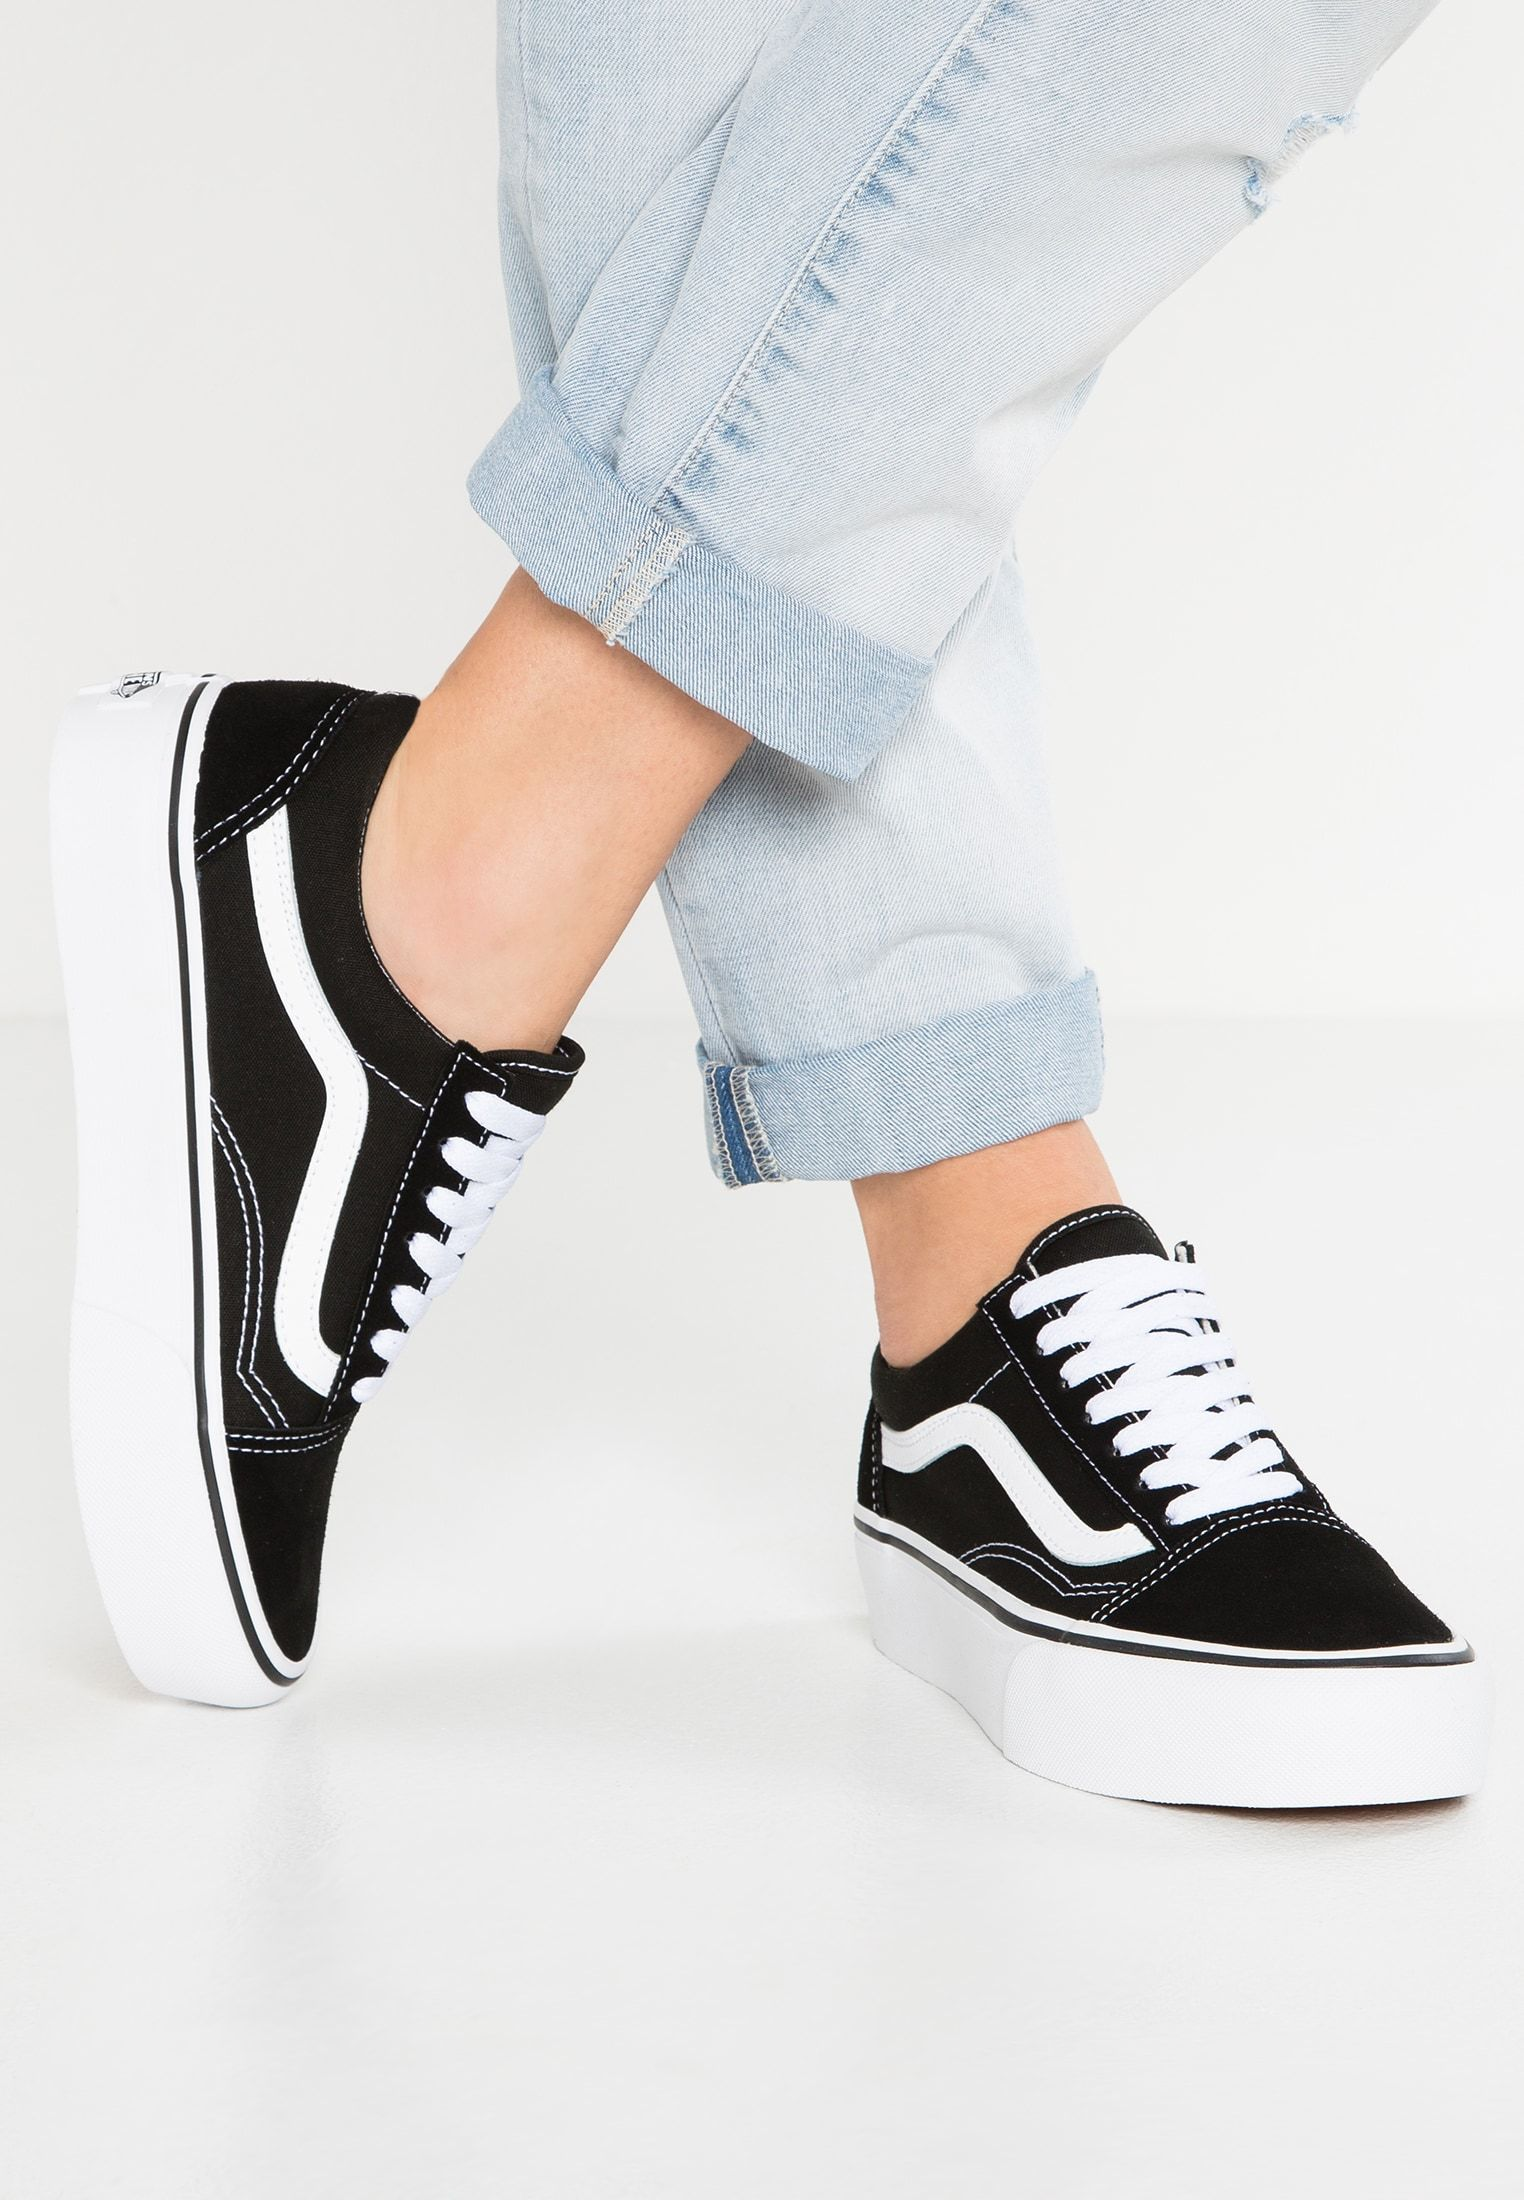 Ua Old Skool Platform Sneaker Low Black White Zalando De In 2020 Vans Schuhe Damen Turnschuhe Damen Vans Outfit